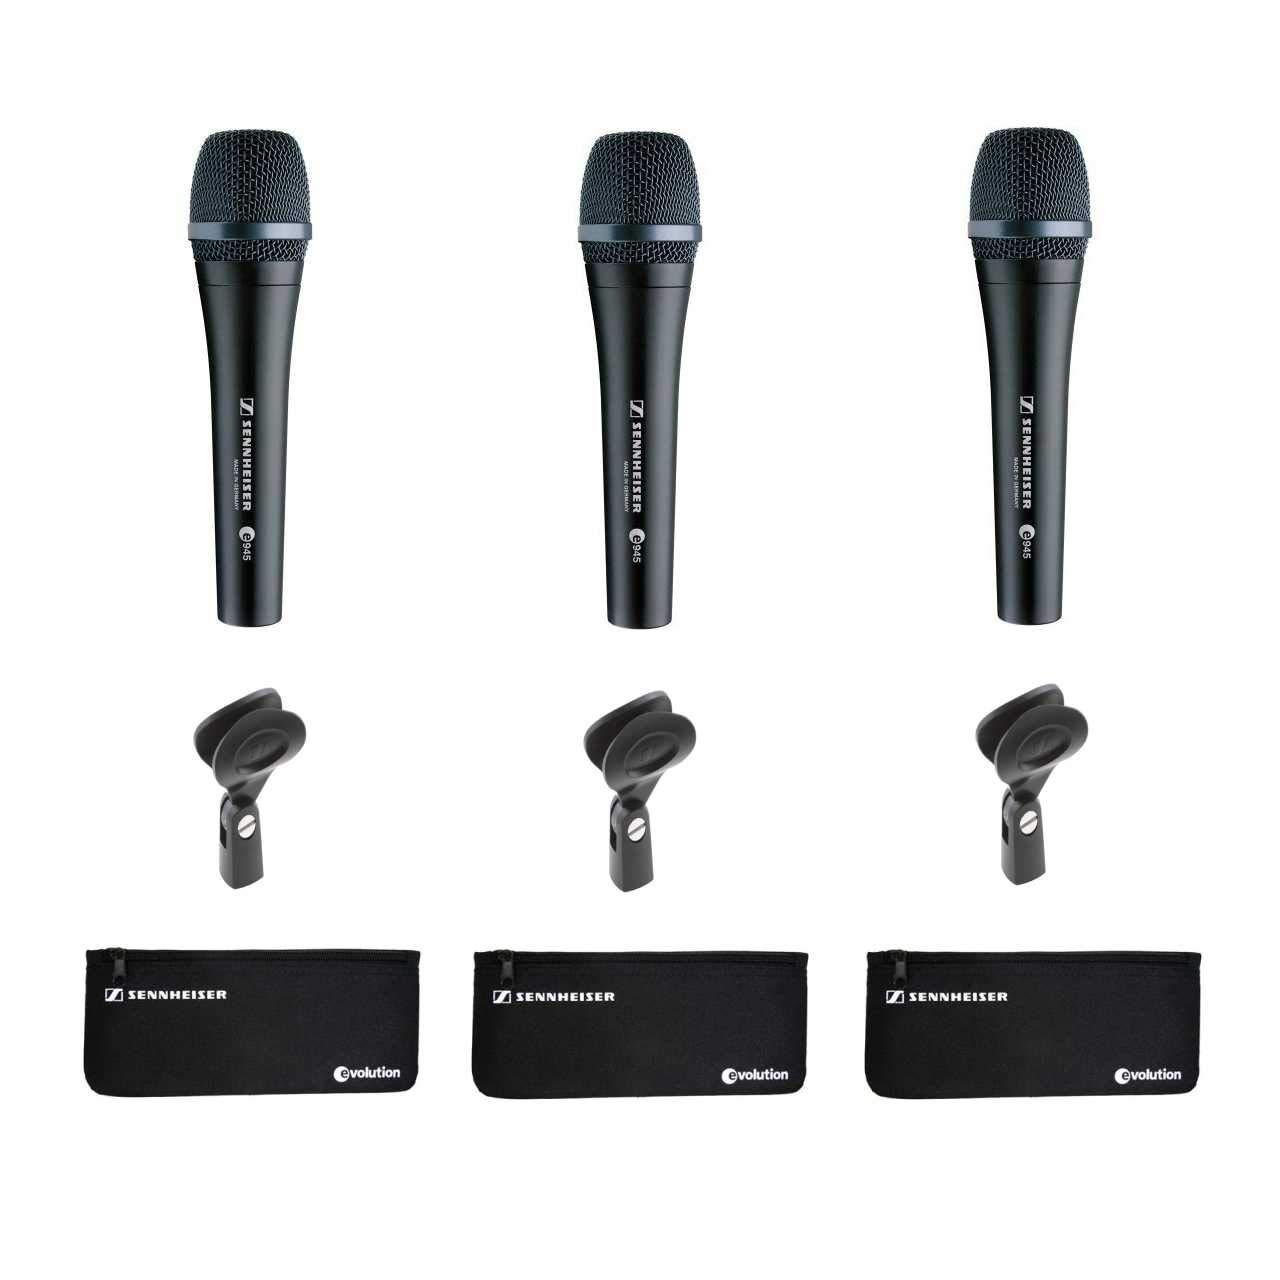 Sennheiser E945 Supercardioid Dynamic Handheld Vocal E935 Microphone 3 Pack Musical Instruments